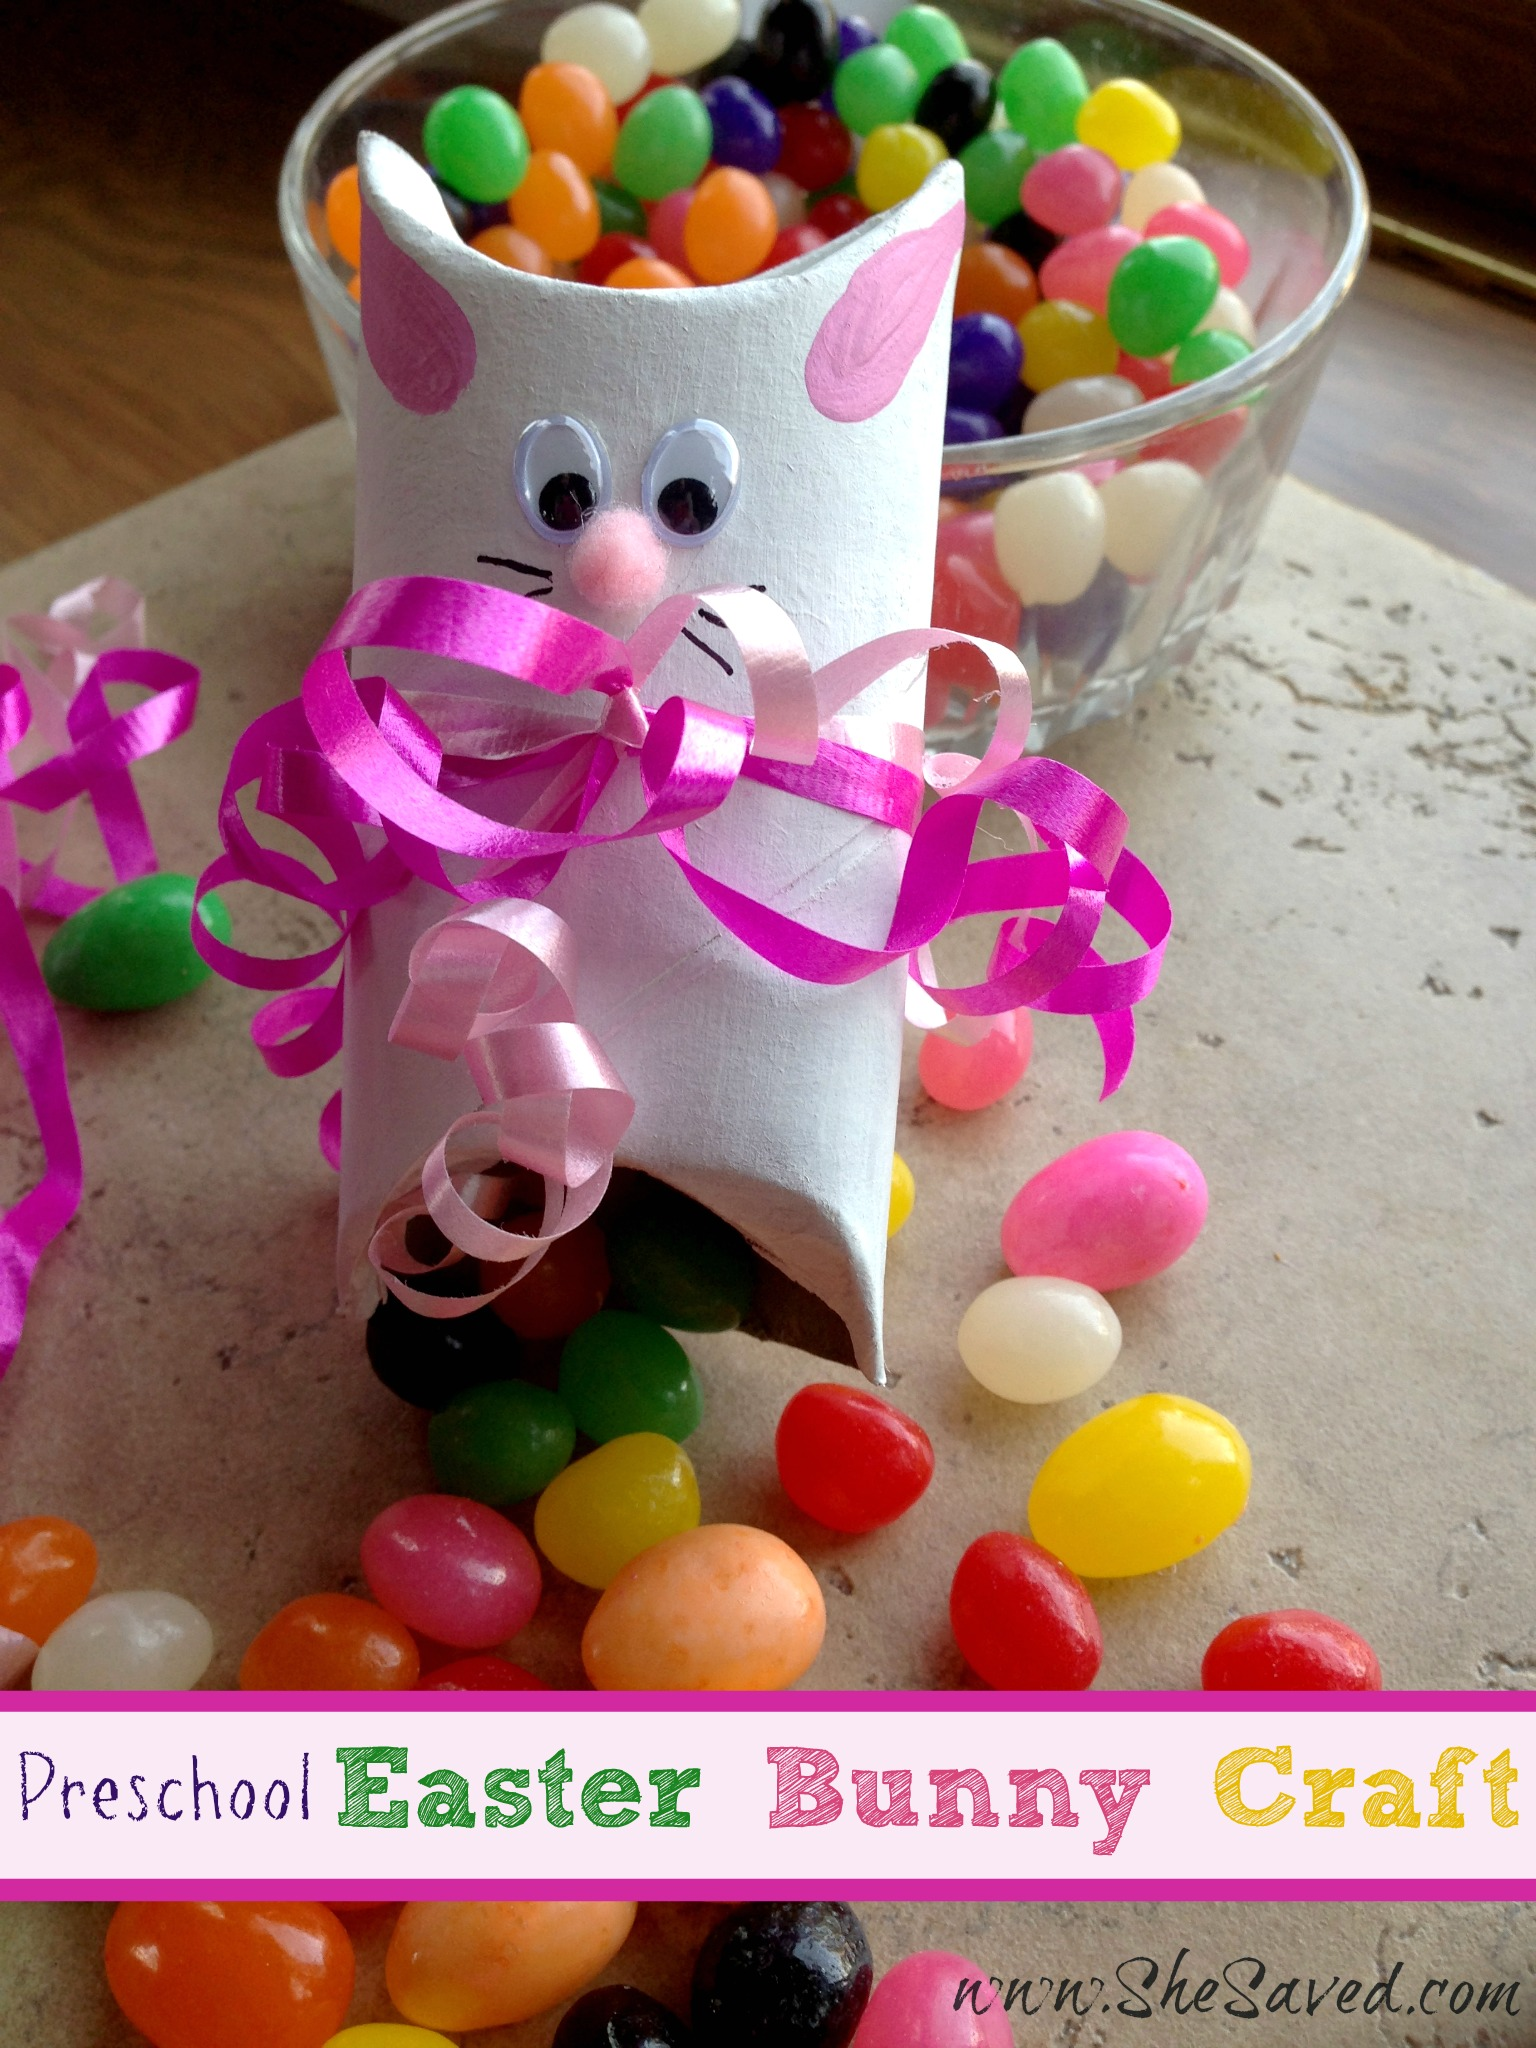 Preschool Easter Bunny Crafts